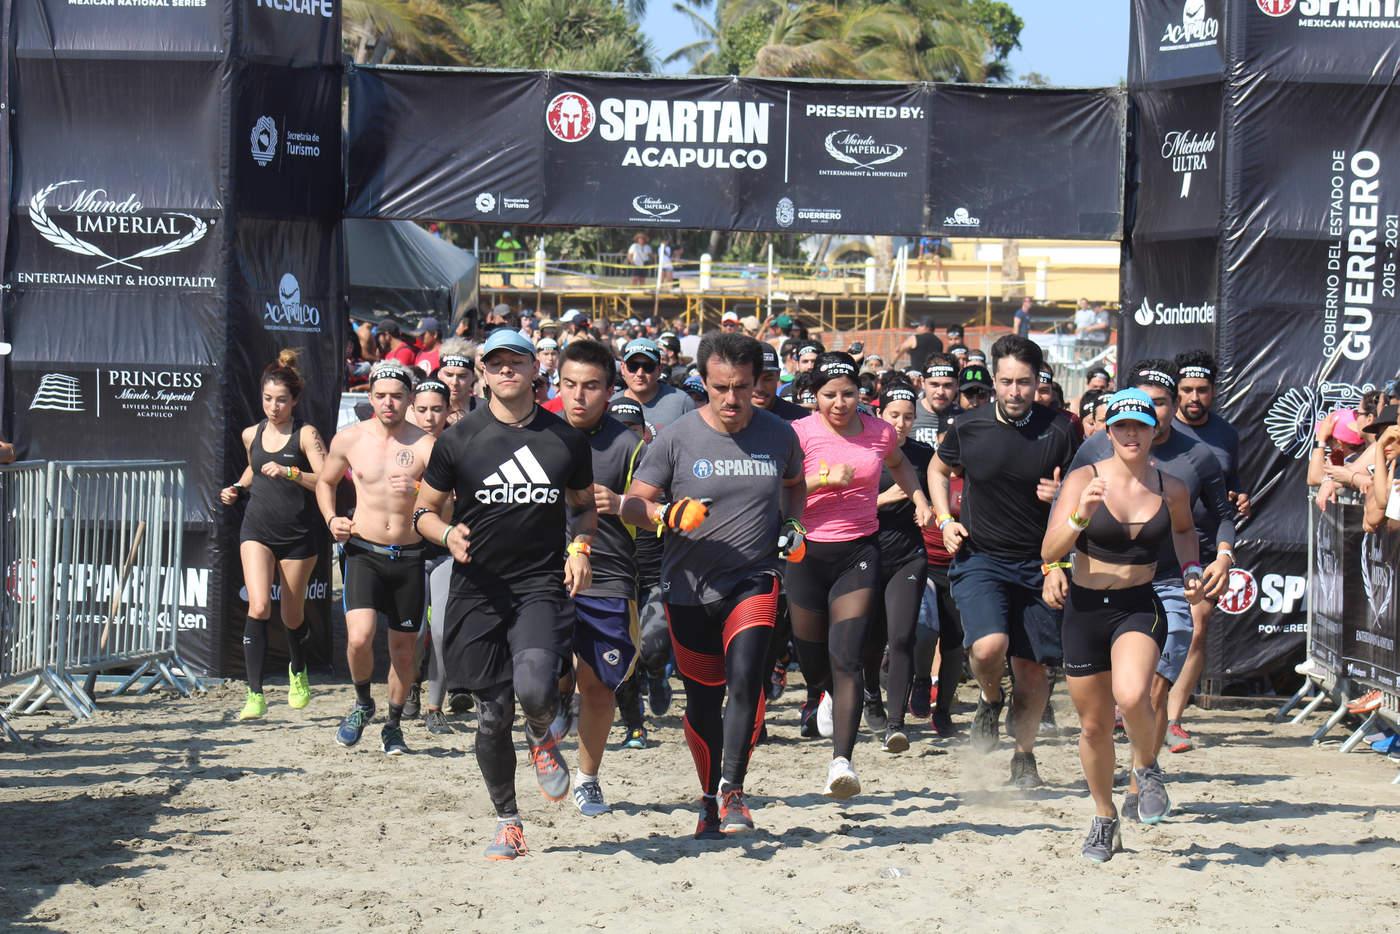 spartan race acapulco princess